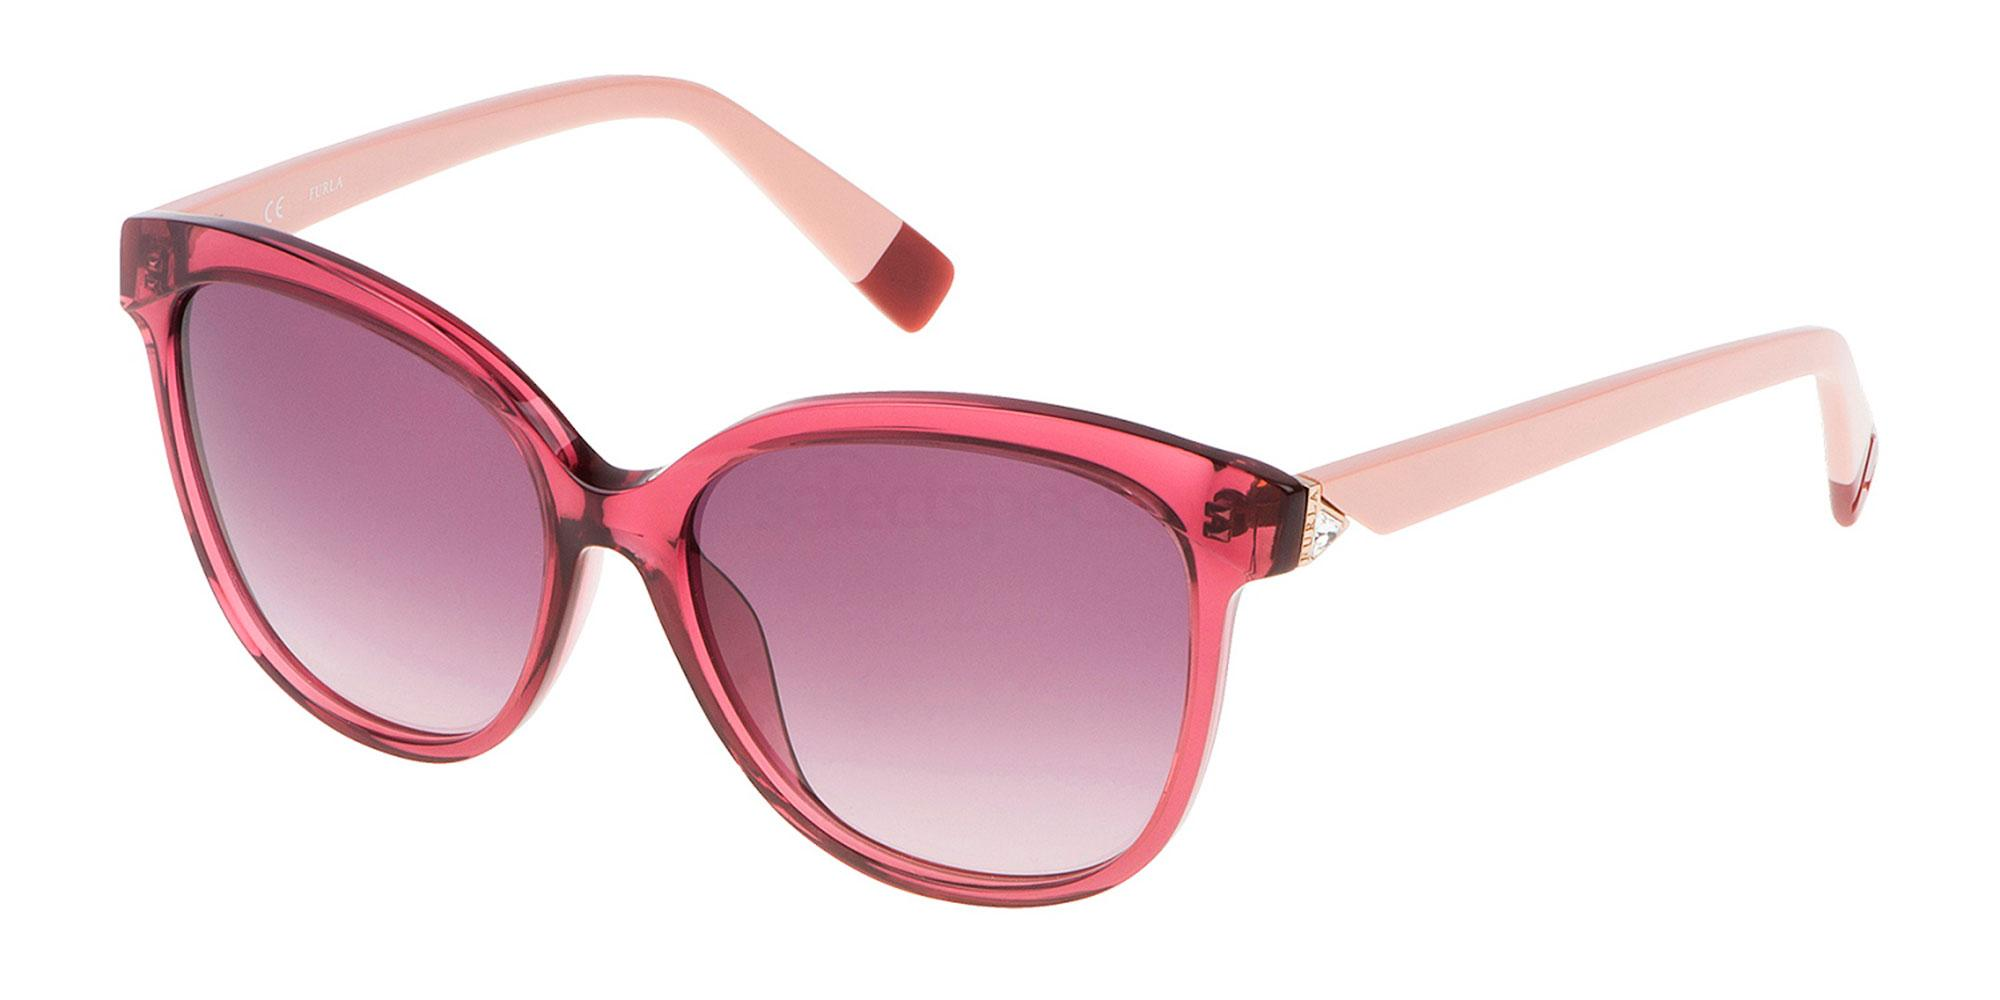 06NL SU4962S Sunglasses, Furla